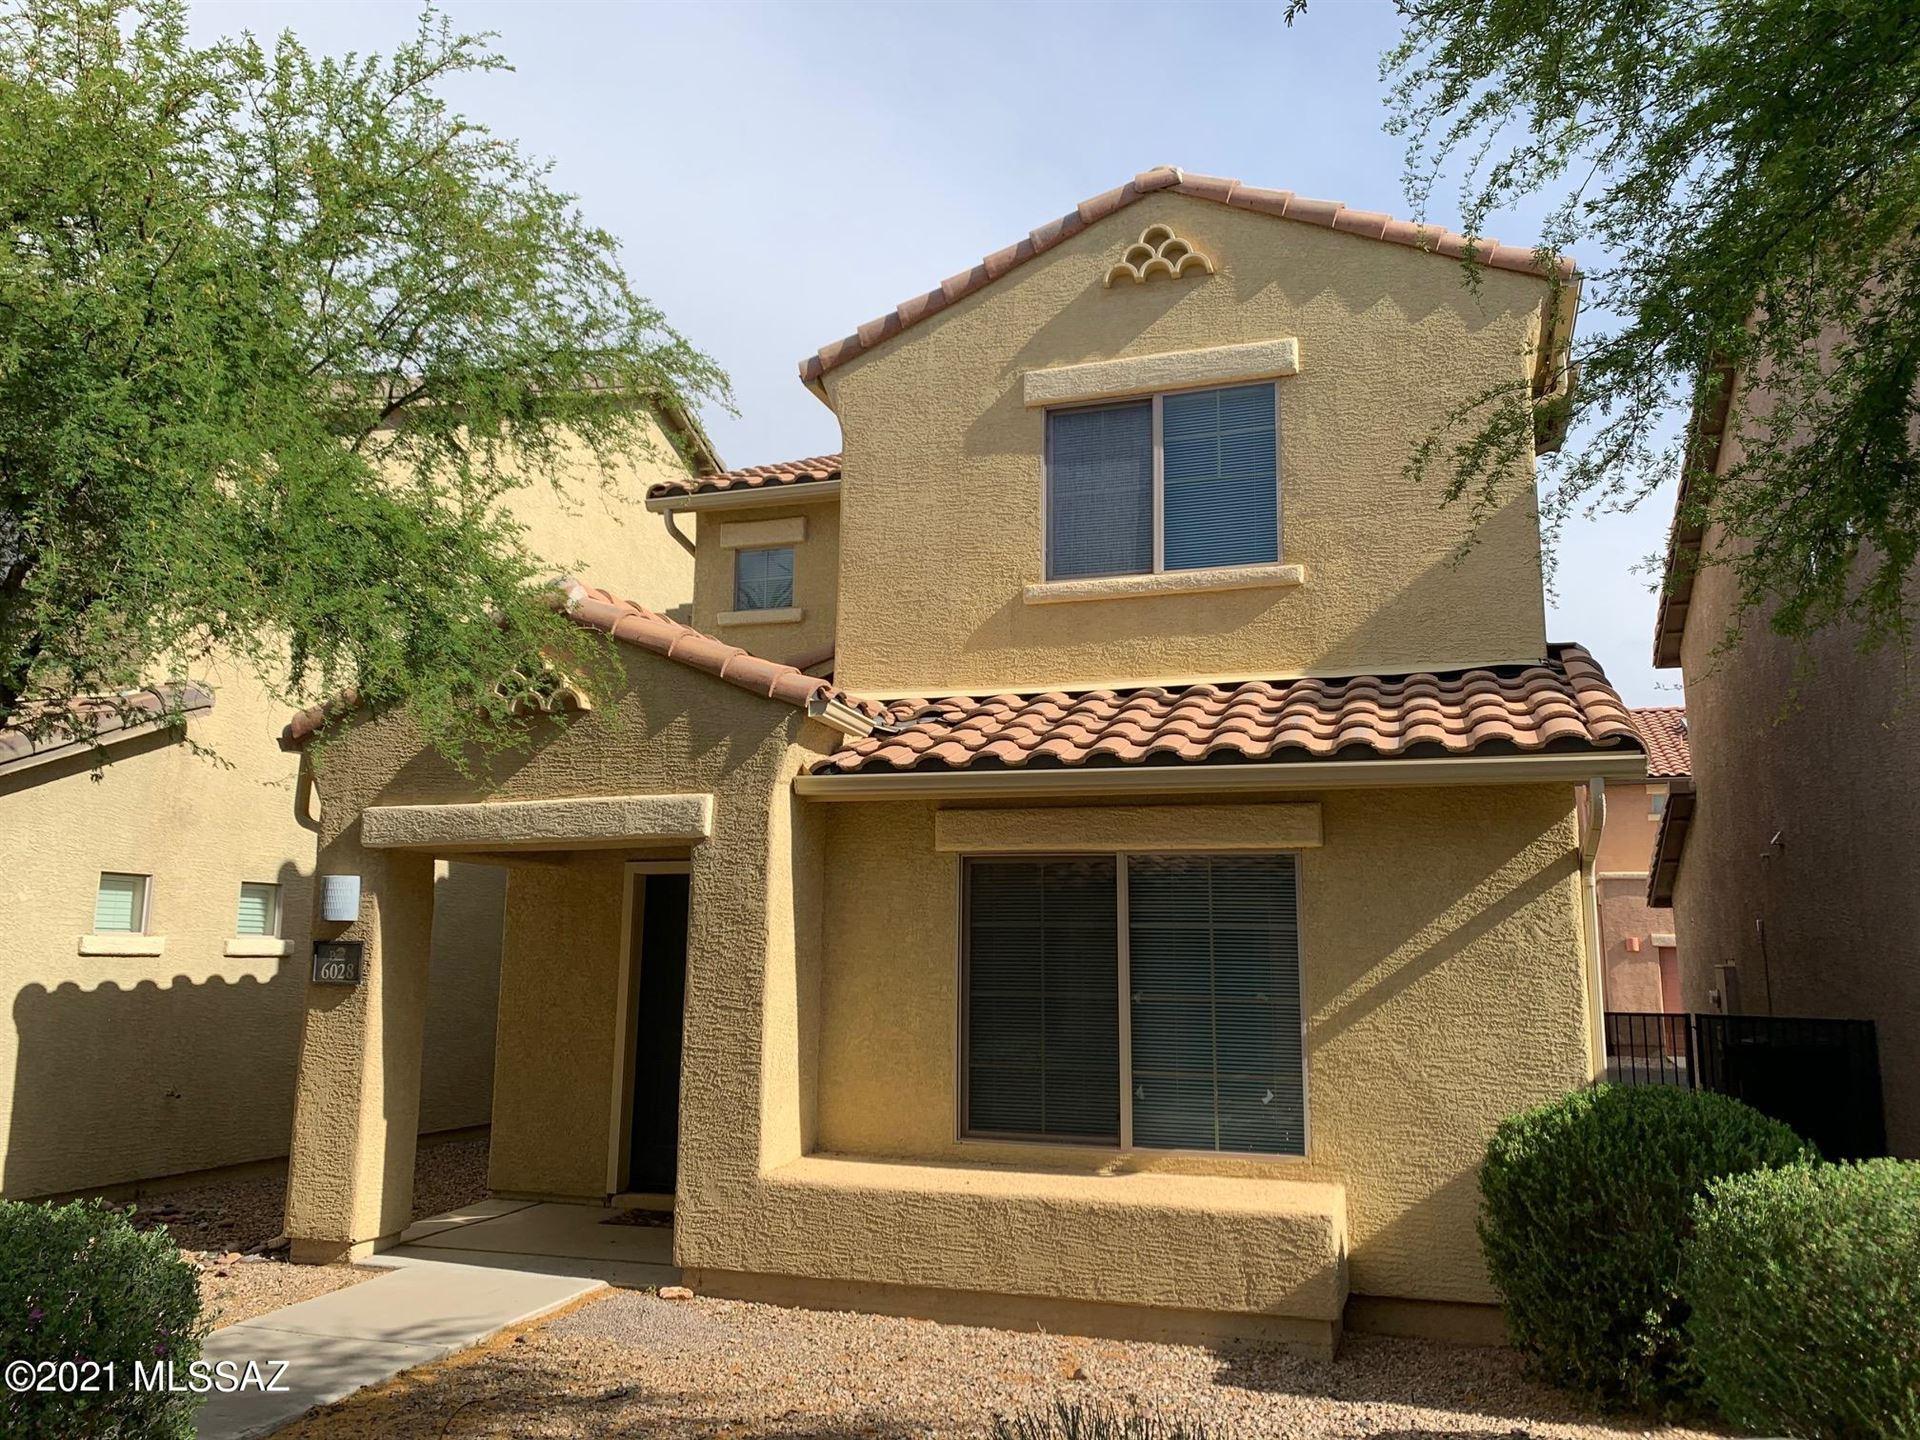 6028 S Sweet Birch Lane, Tucson, AZ 85747 - MLS#: 22110894